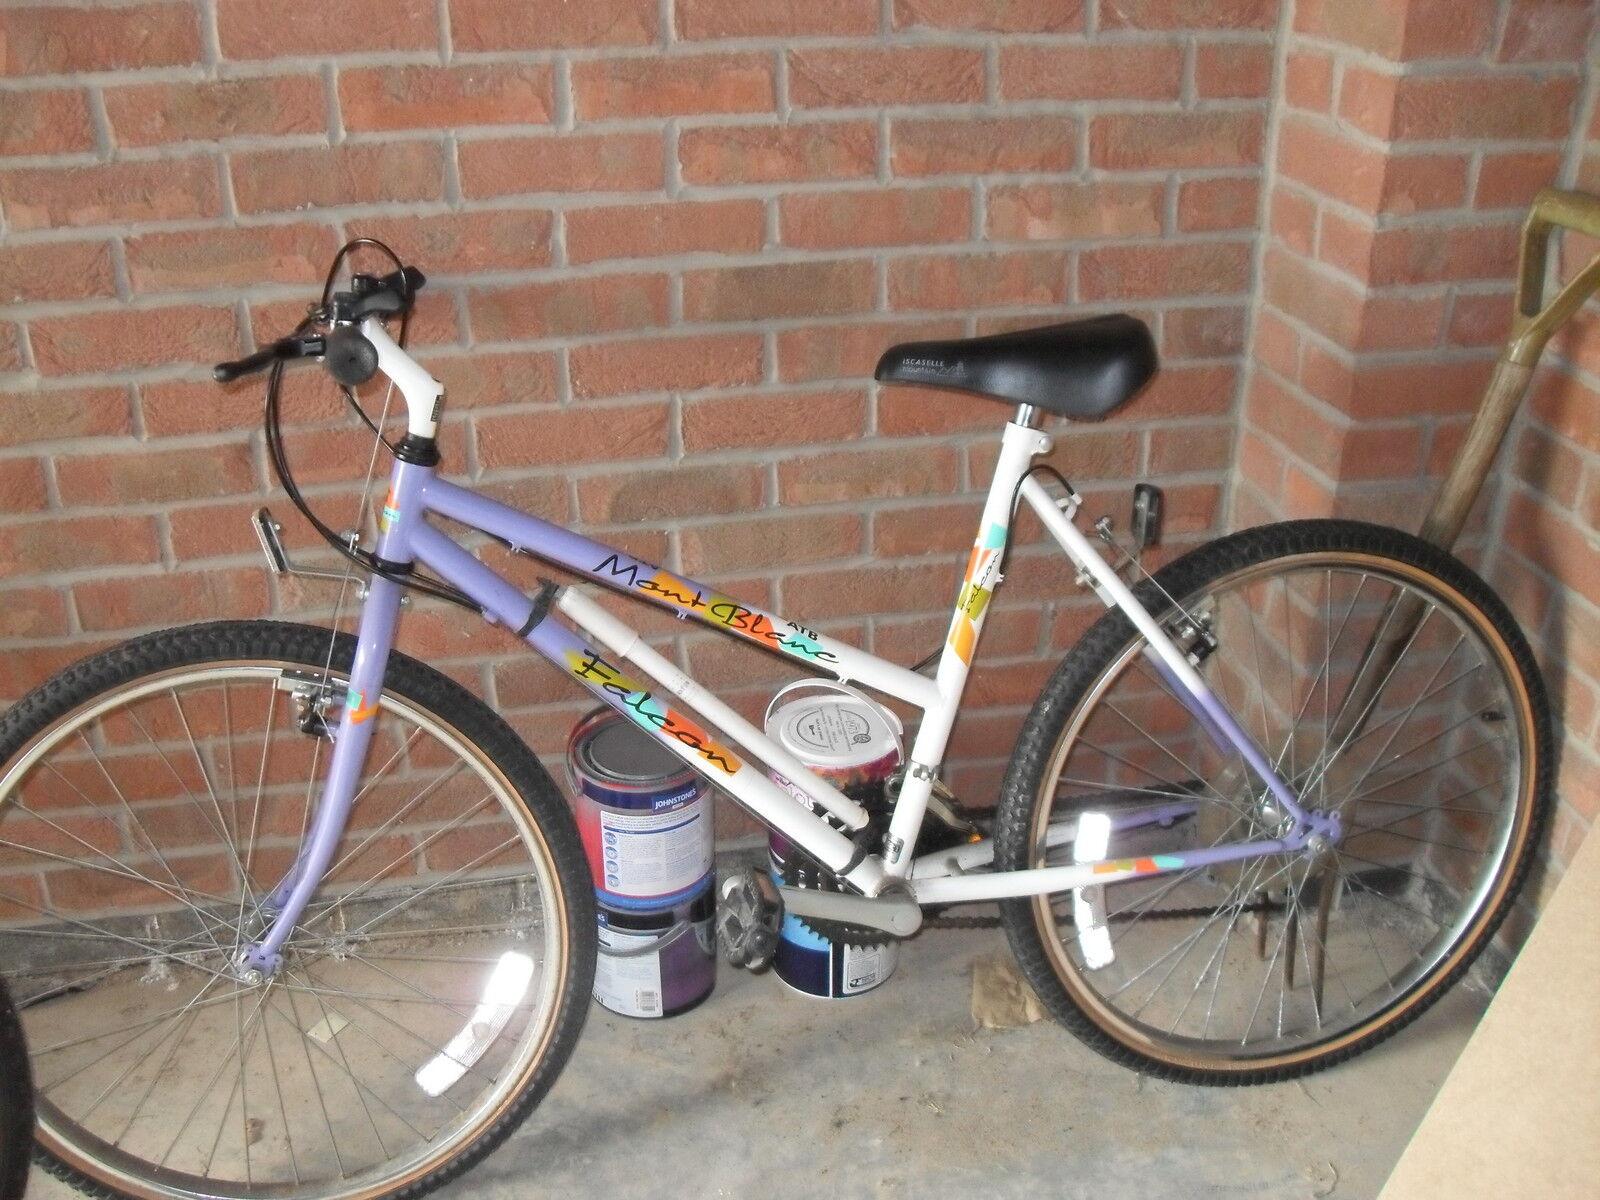 Ladies bike (Mont white Falcon)